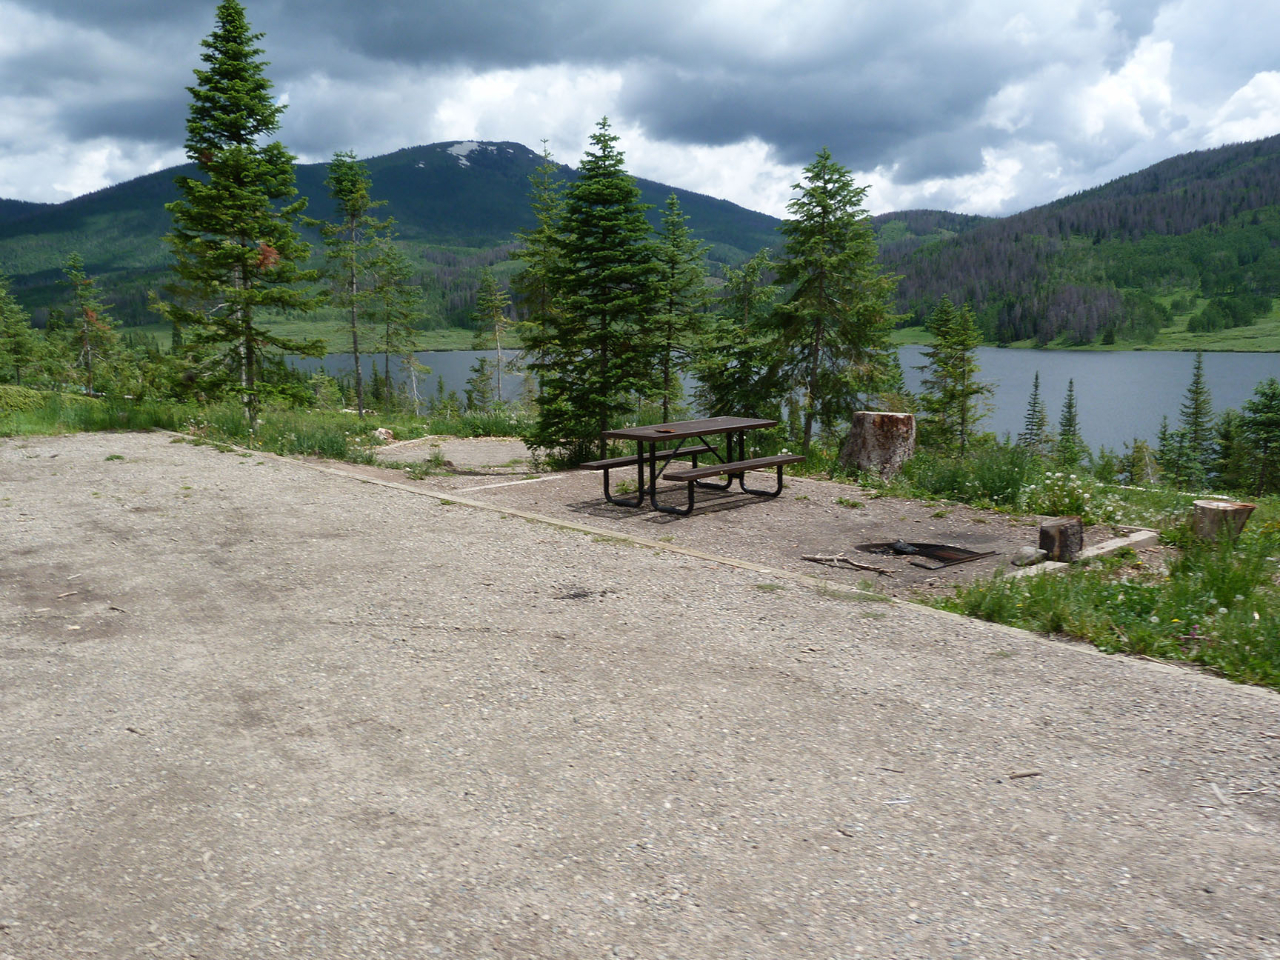 pearl-lake-state-park-campground-large-flat-parking